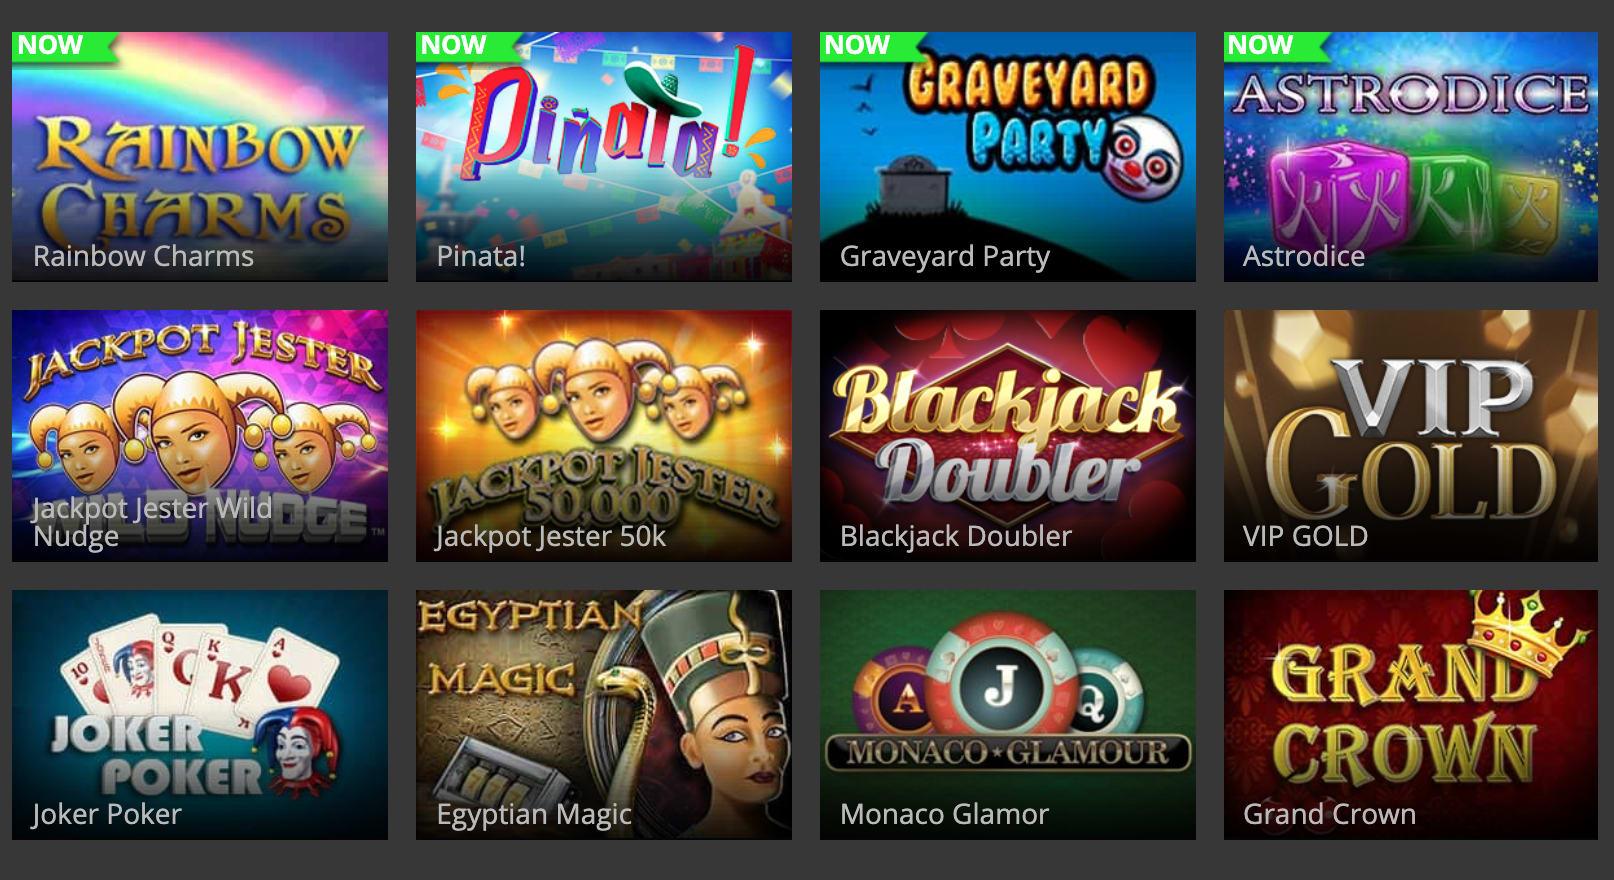 Spille spil på online casino Dansk777.dk